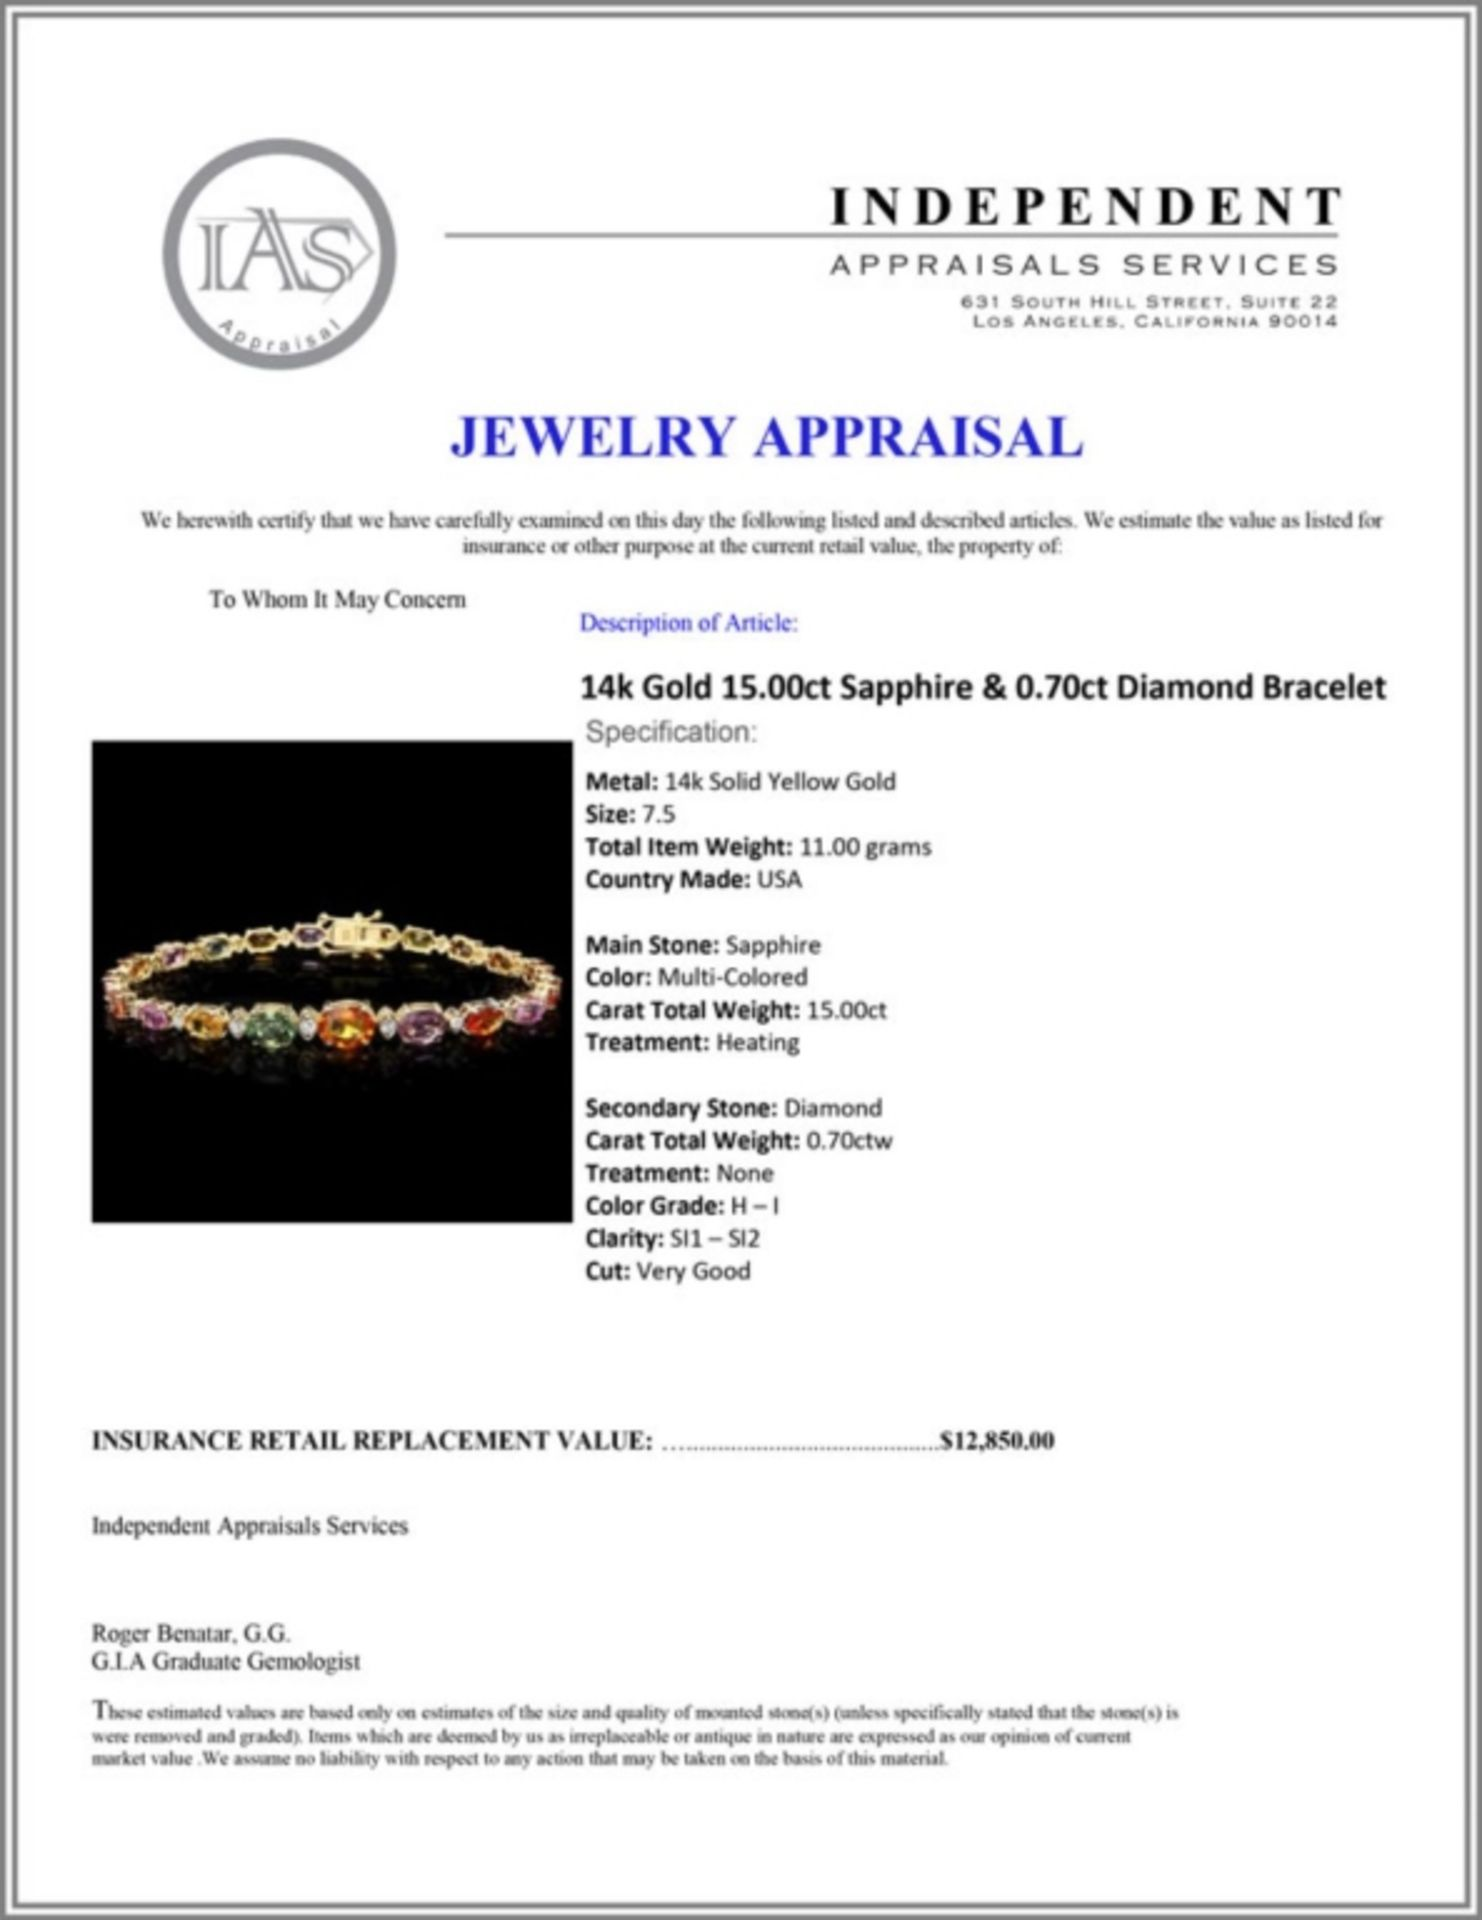 14k Gold 15.00ct Sapphire & 0.70ct Diamond Bracel - Image 3 of 3